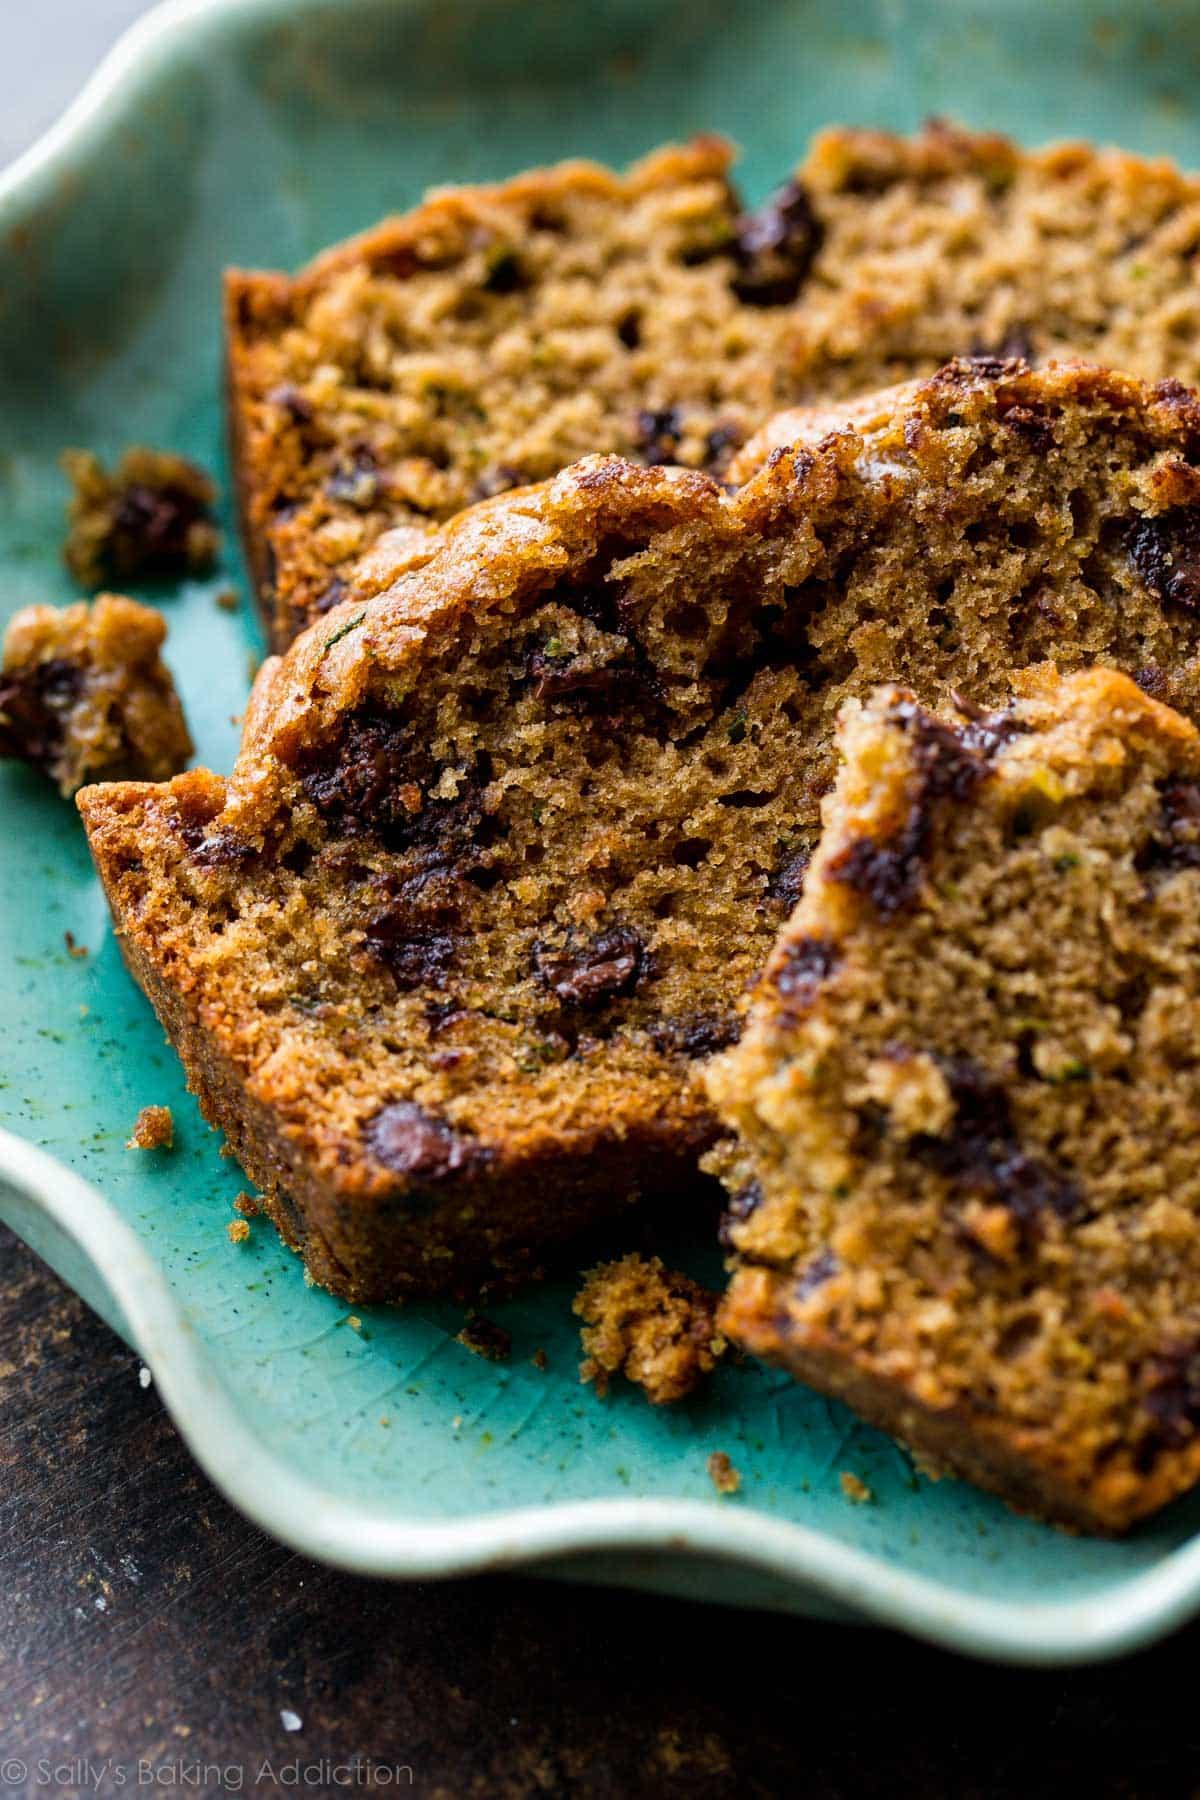 Here's an award winning recipe for zucchini bread + zucchini bread muffins! With brown sugar, vanilla, and cinnamon, you can't taste the zucchini! Recipe on sallysbakingaddiction.com